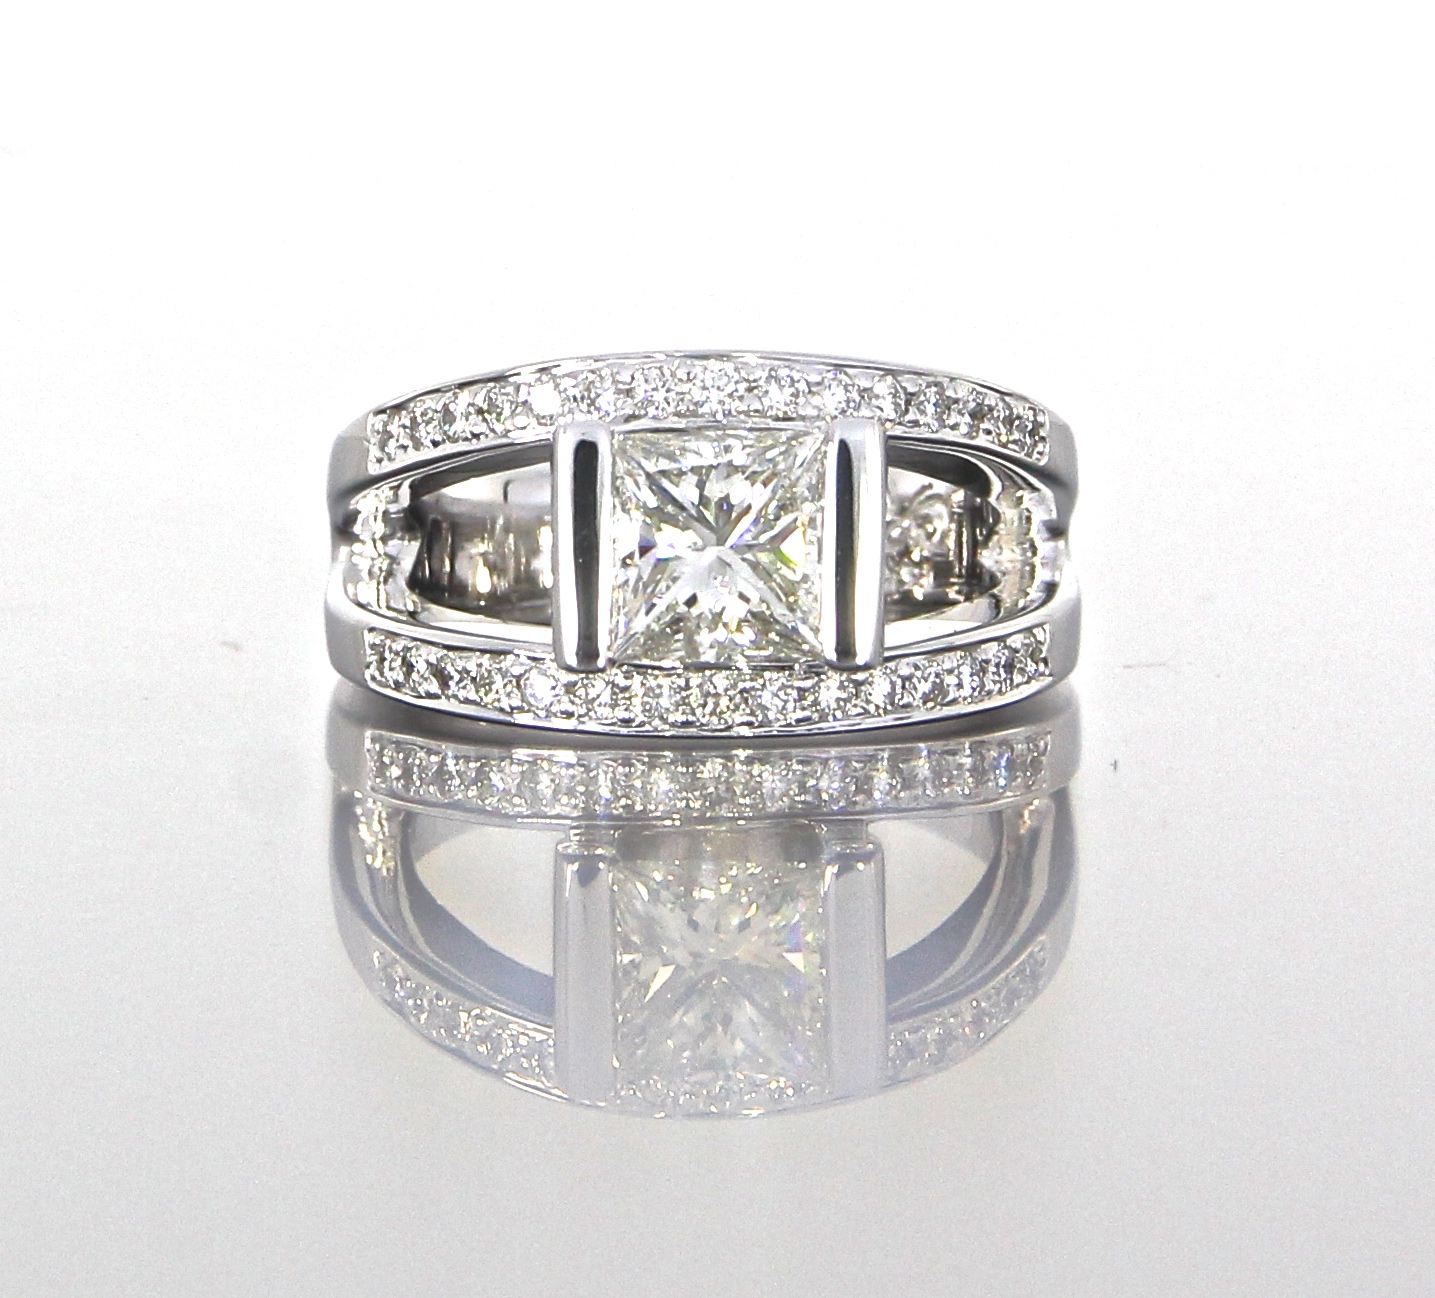 unique-princess-cut-diamond-split-shank-engagement-ring-craft-revival-jewelry-store-grand-rapids.jpg